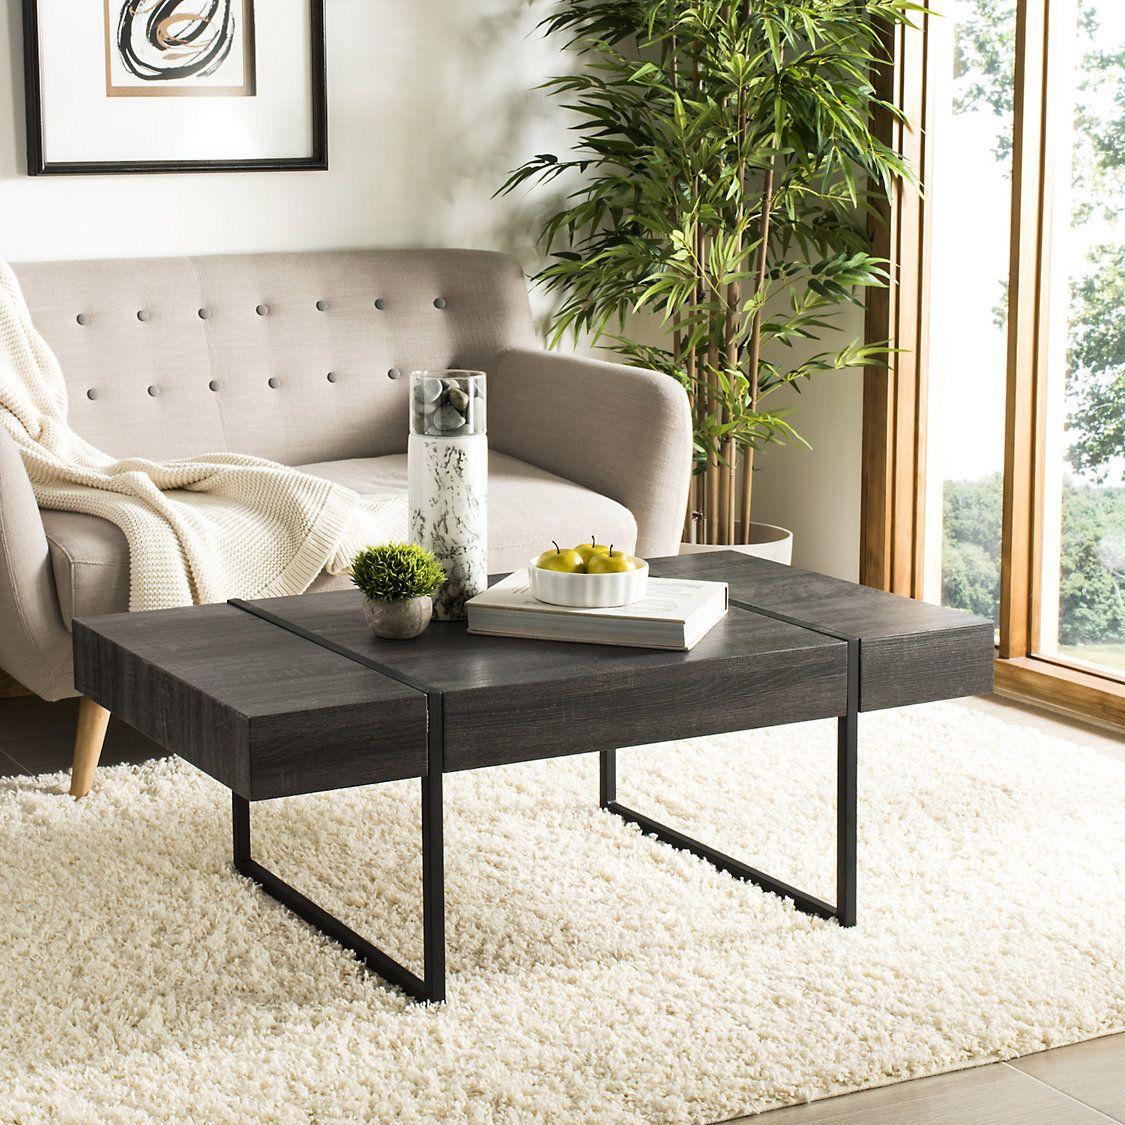 Safavieh Tristan Rectangle Modern Coffee Table Kohls In 2021 Coffee Table Rectangle Coffee Table Wood Table Decor Living Room [ 1125 x 1125 Pixel ]